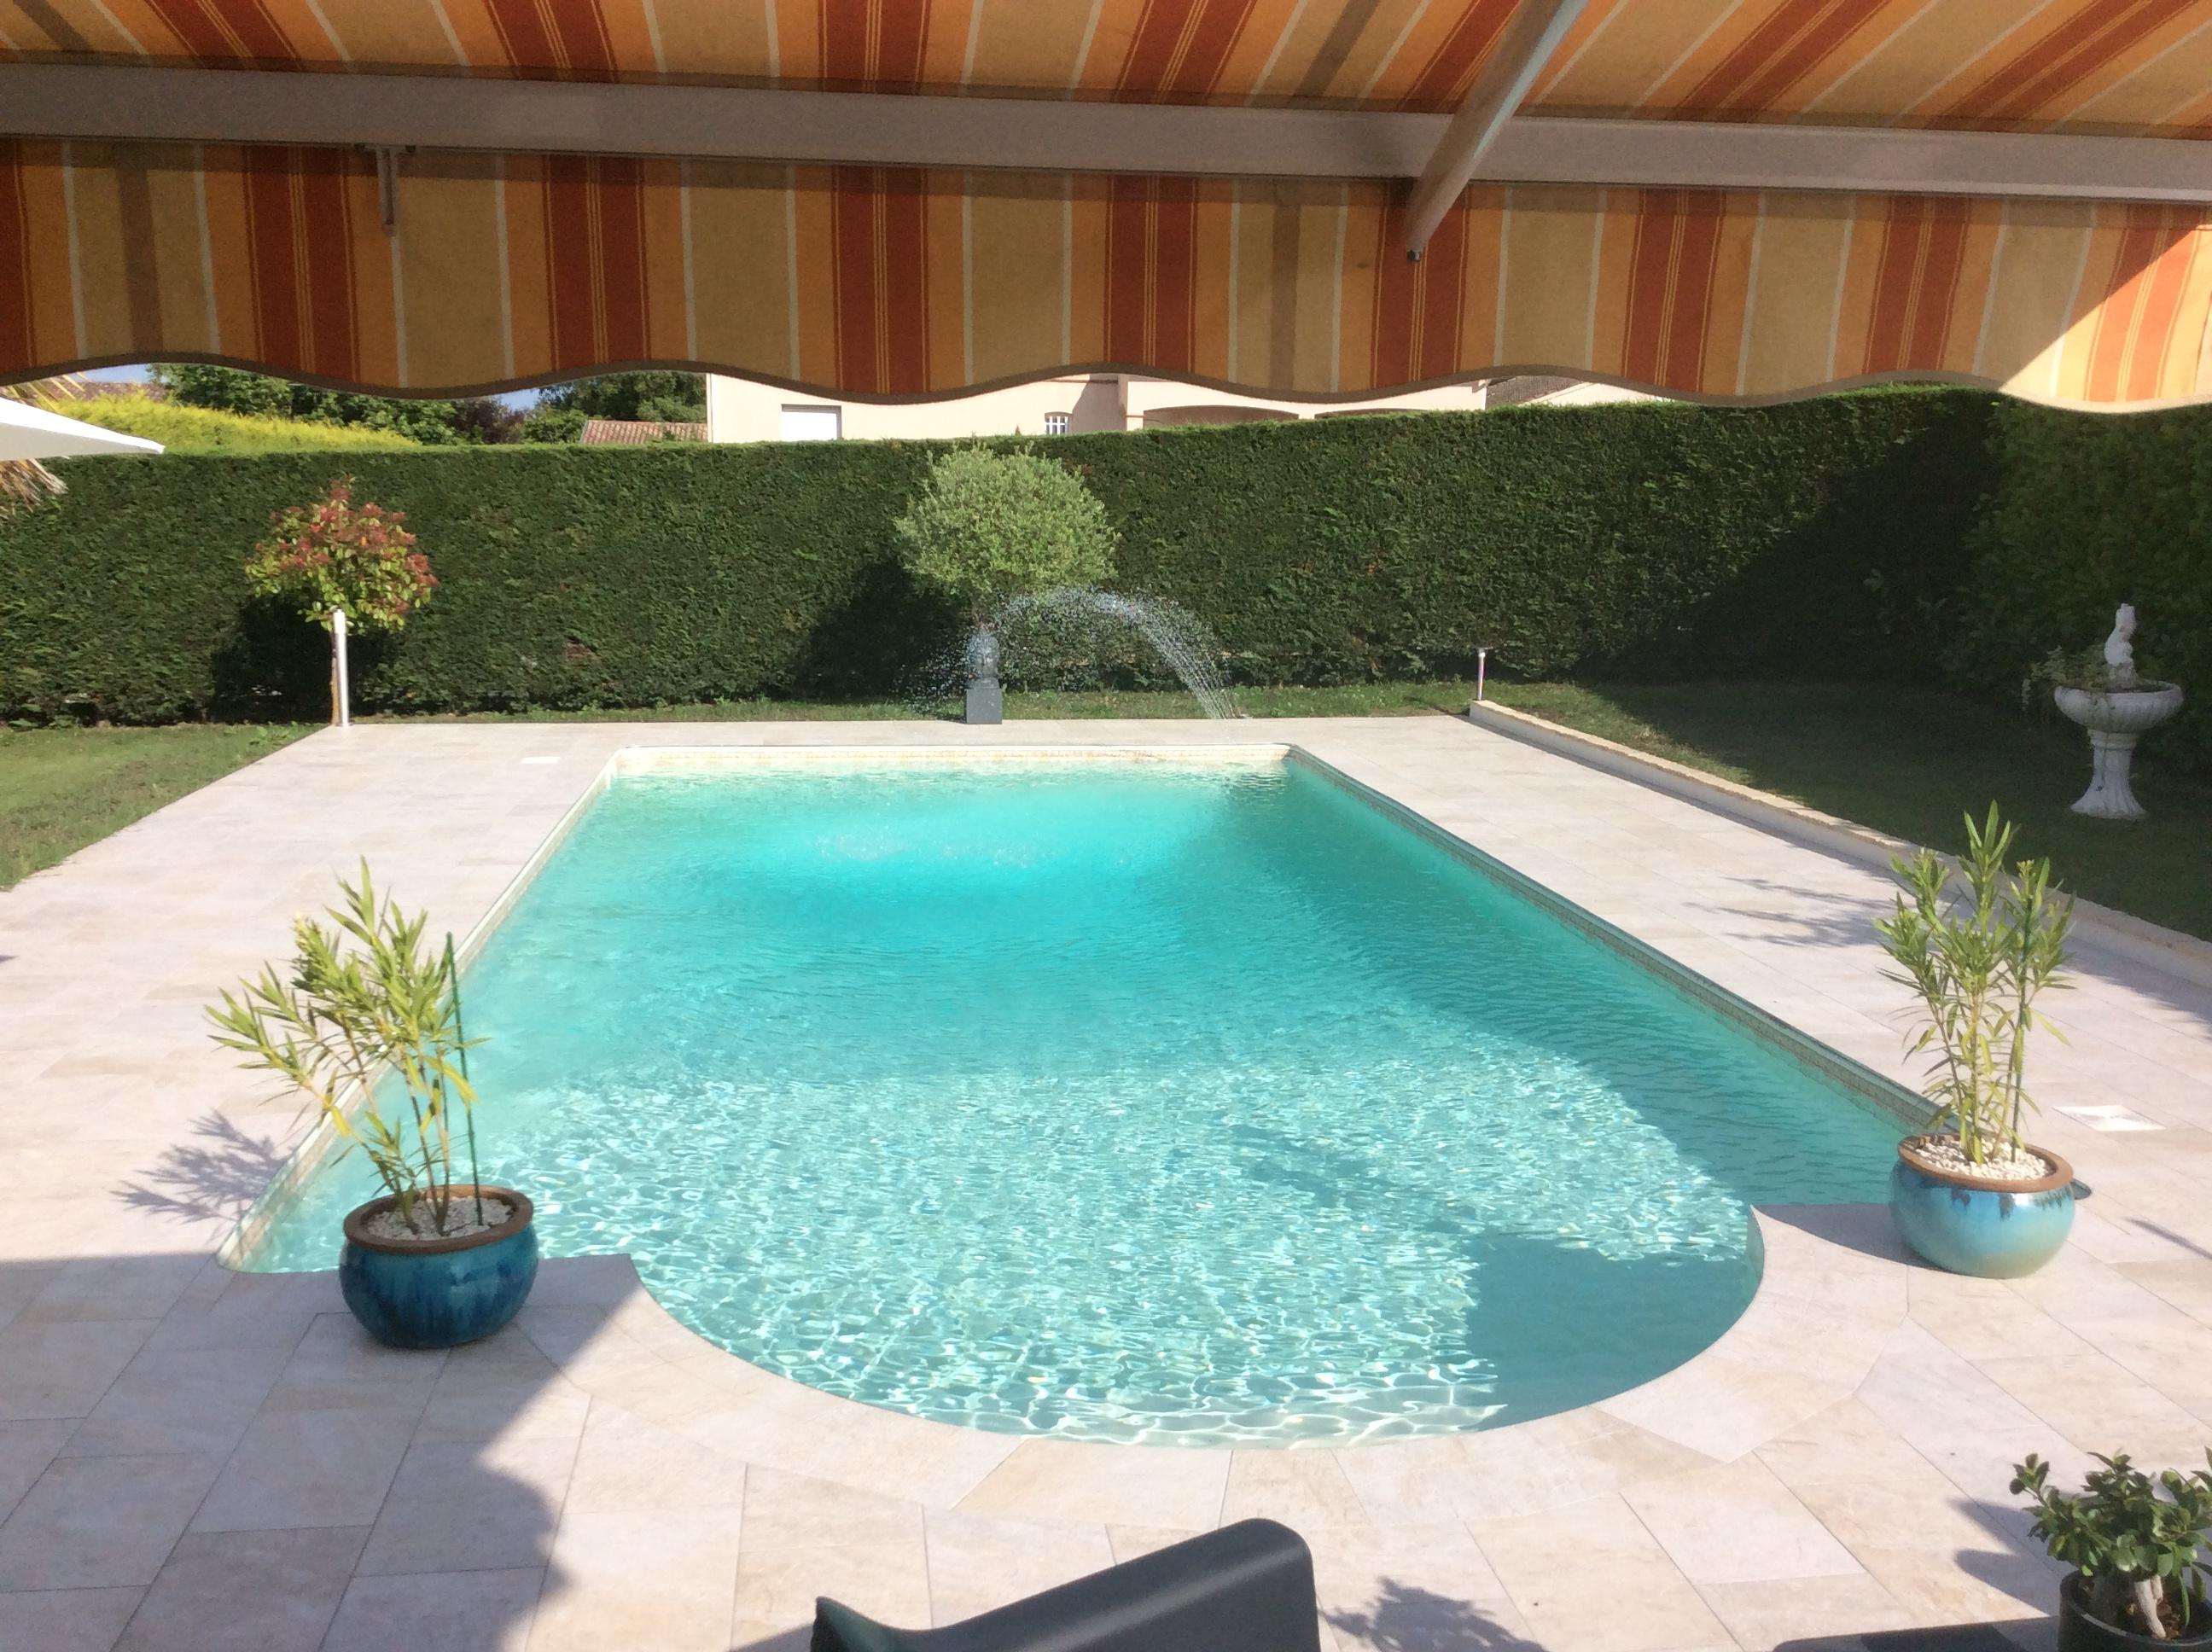 Plage piscine carrelage od39 jornalagora for Carrelage terrasse piscine